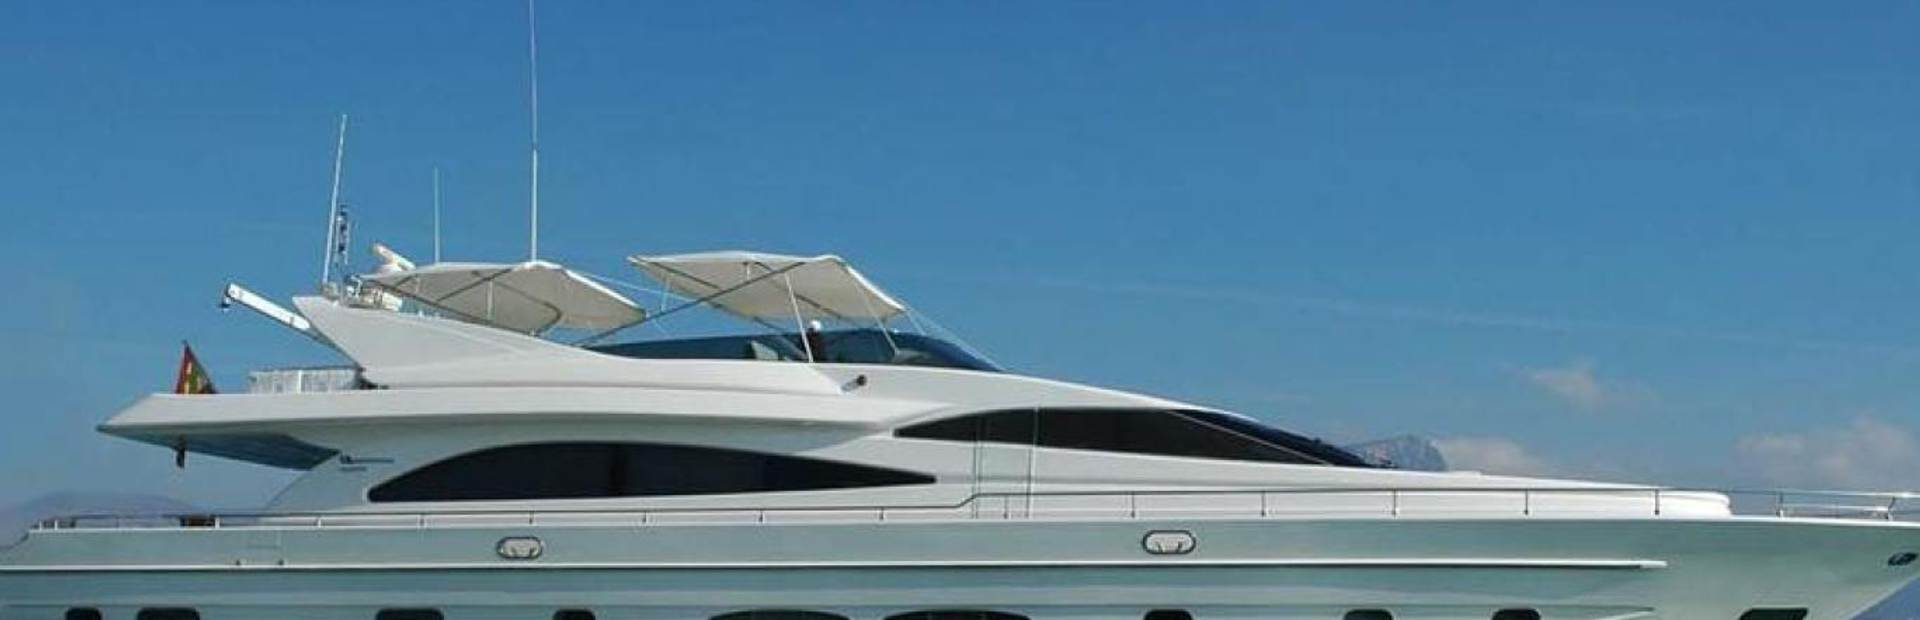 82 GLX Yacht Charter